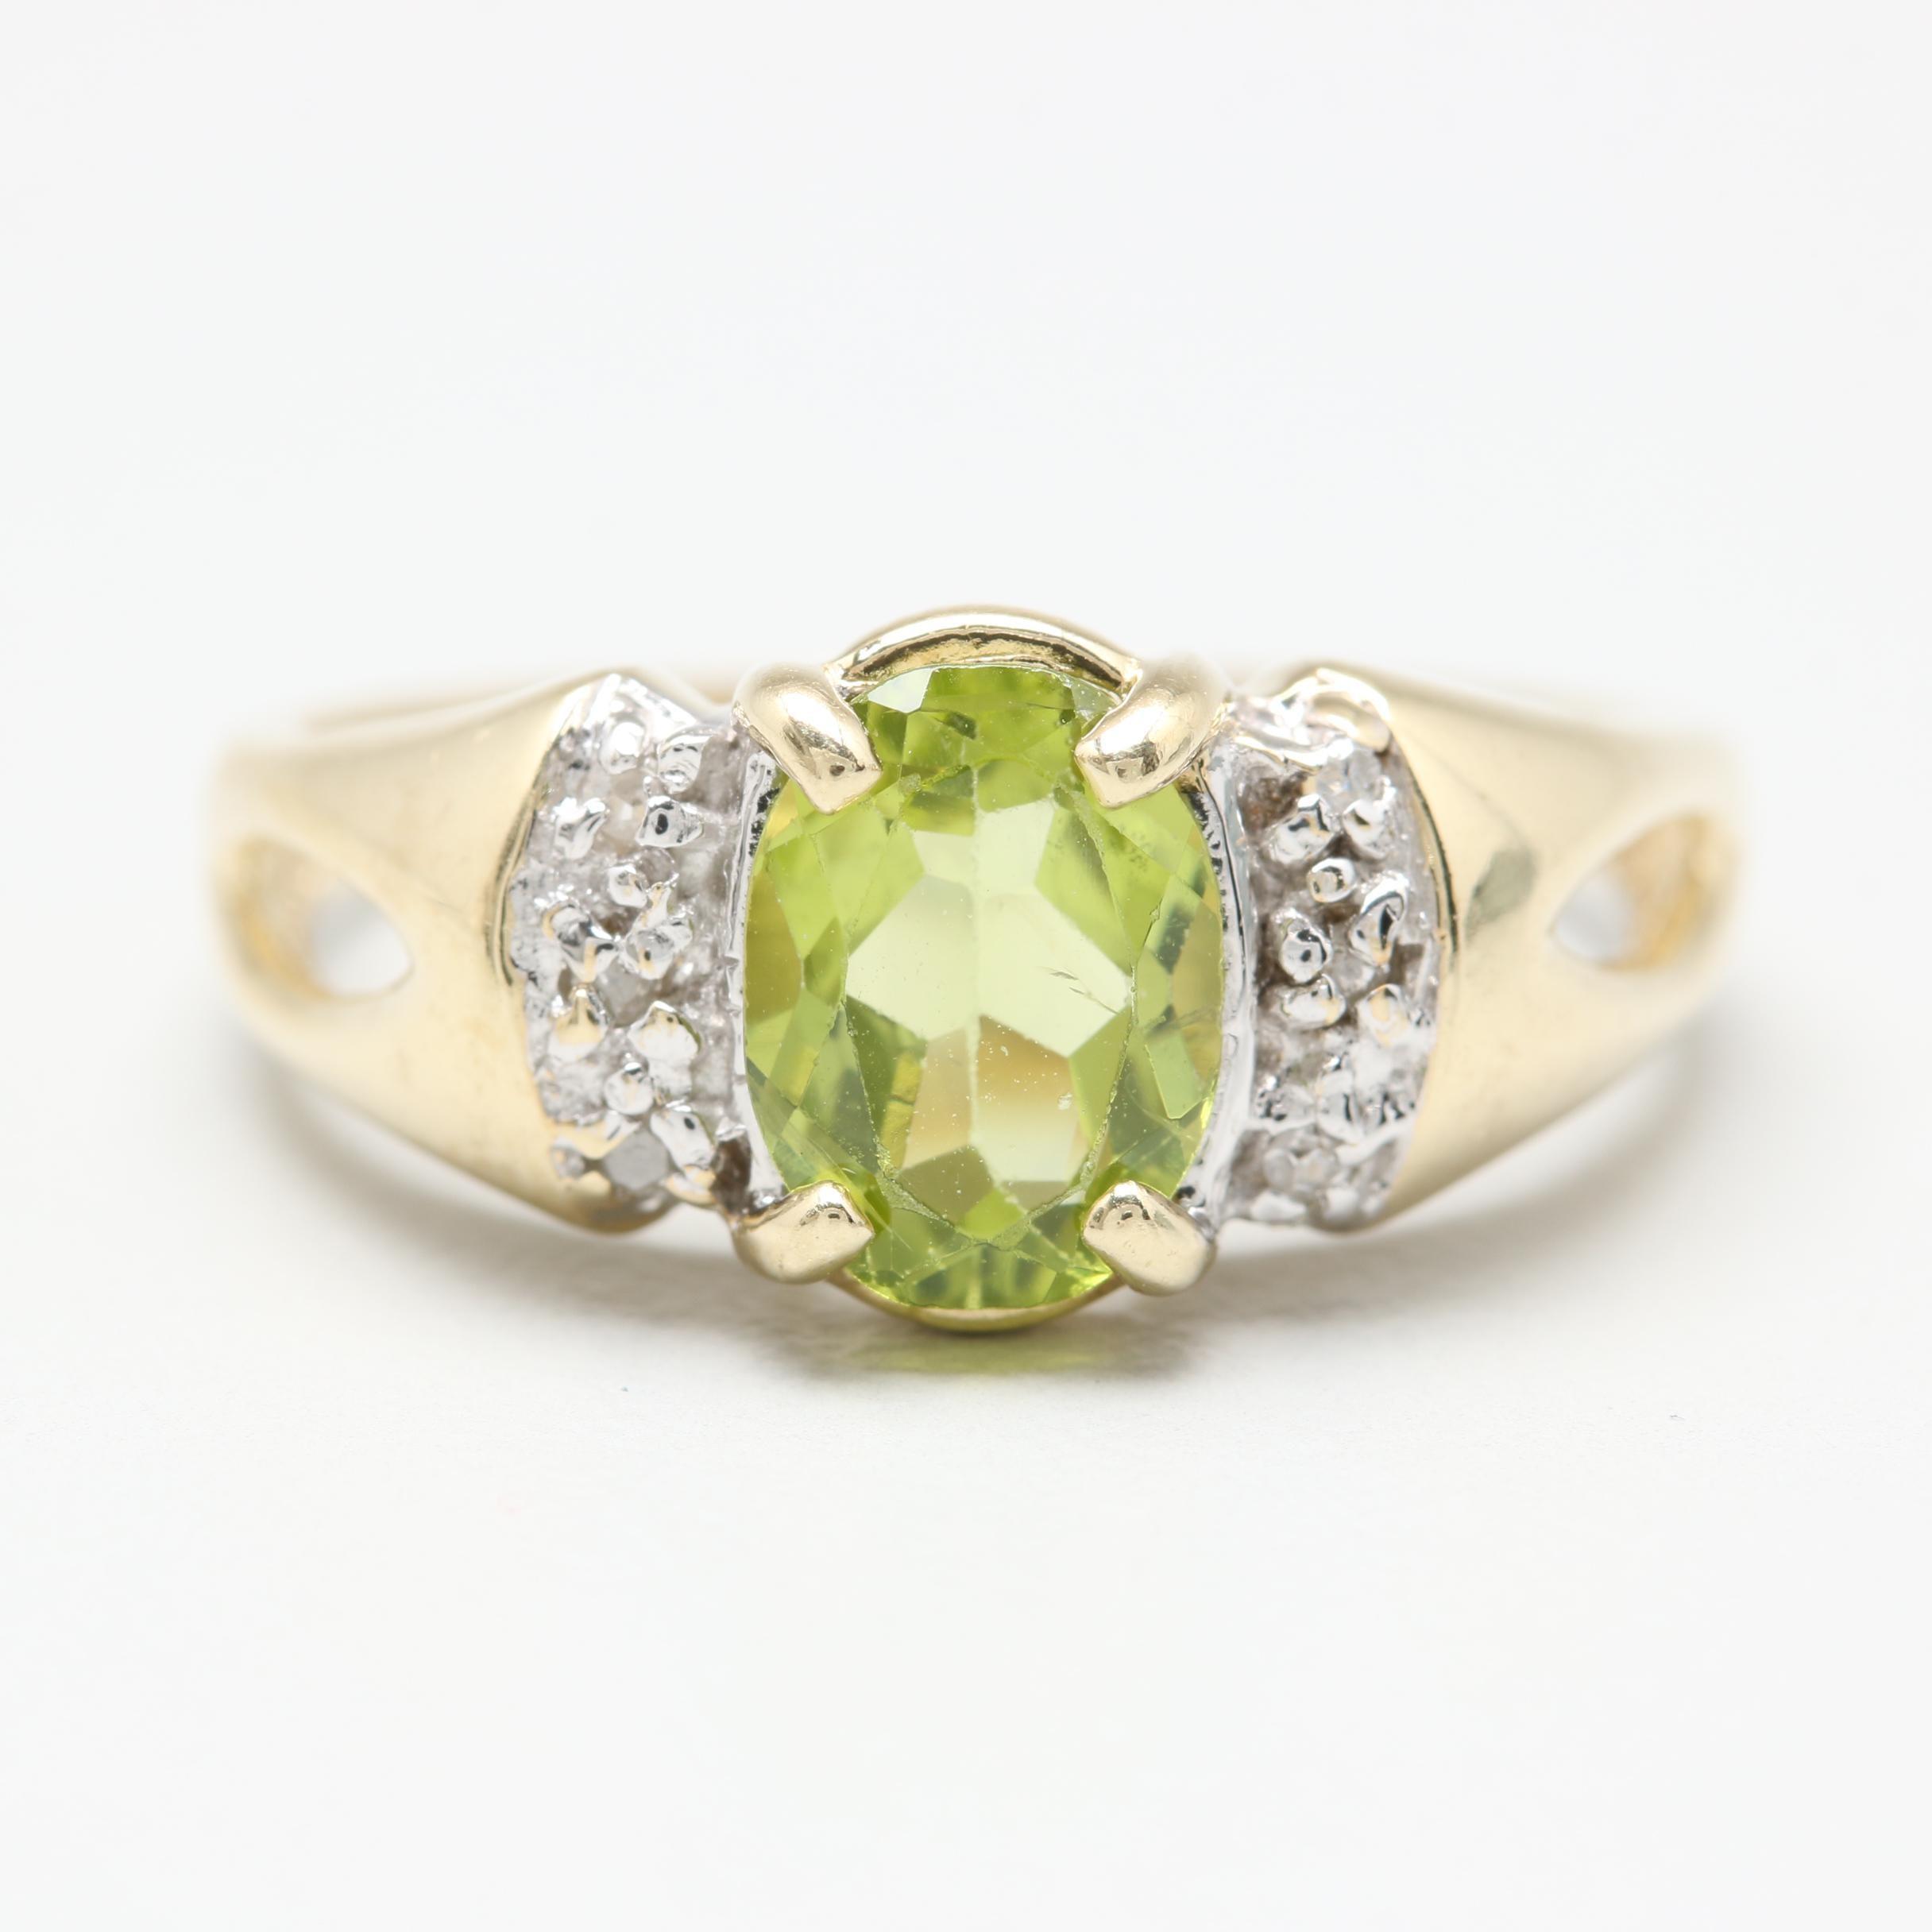 10K Yellow and White Gold Peridot and Diamond Ring